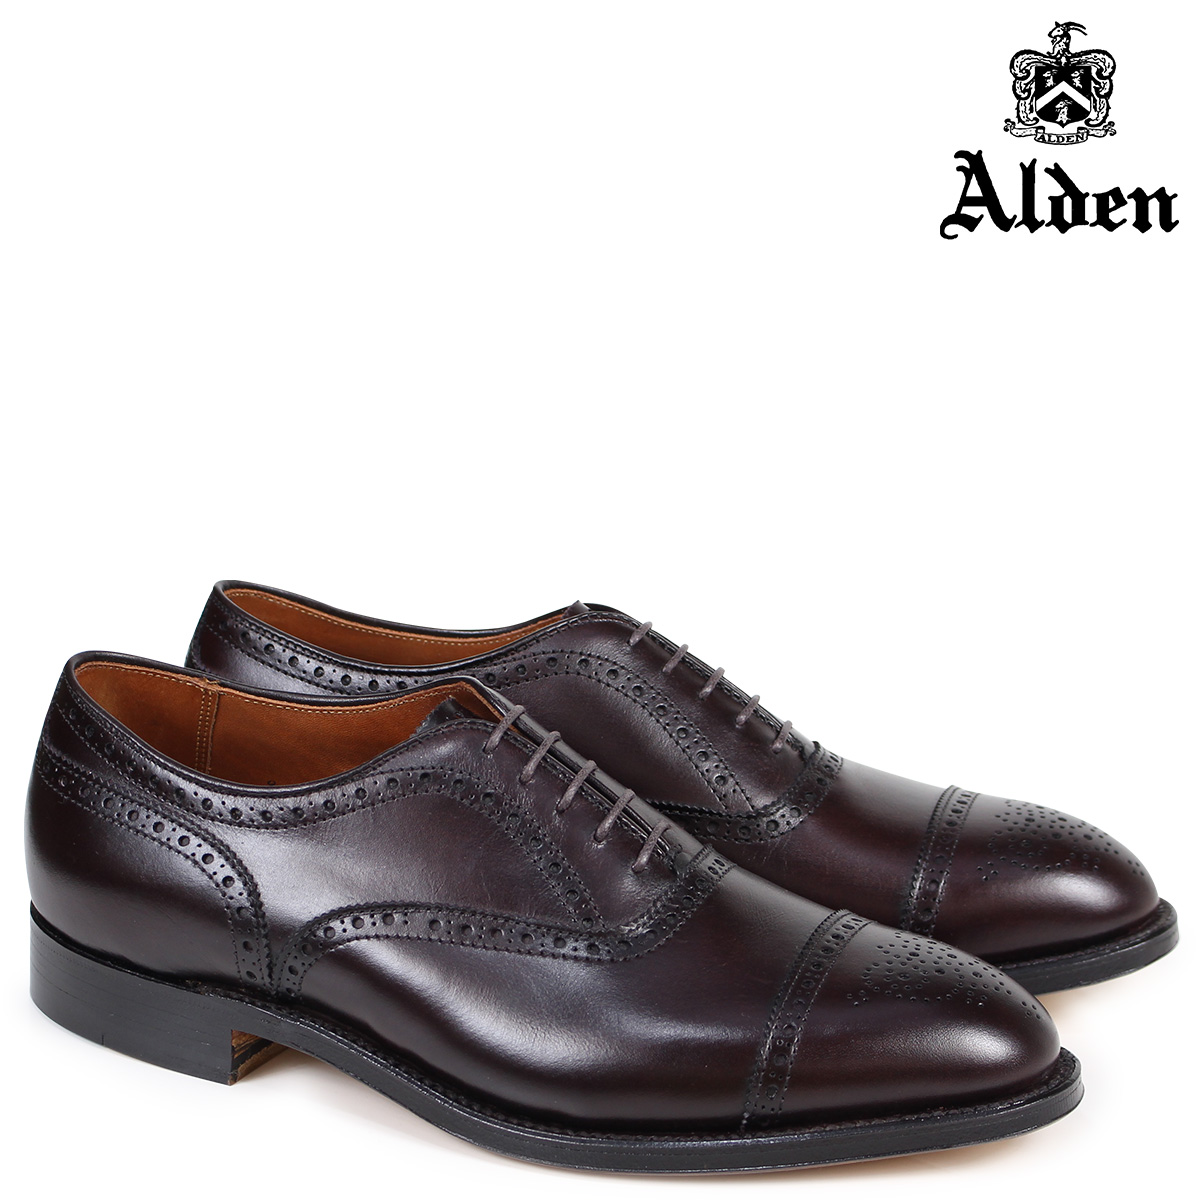 ALDEN オールデン オックスフォード シューズ メンズ MEDALLION TIP BAL OXFORD Dワイズ 908